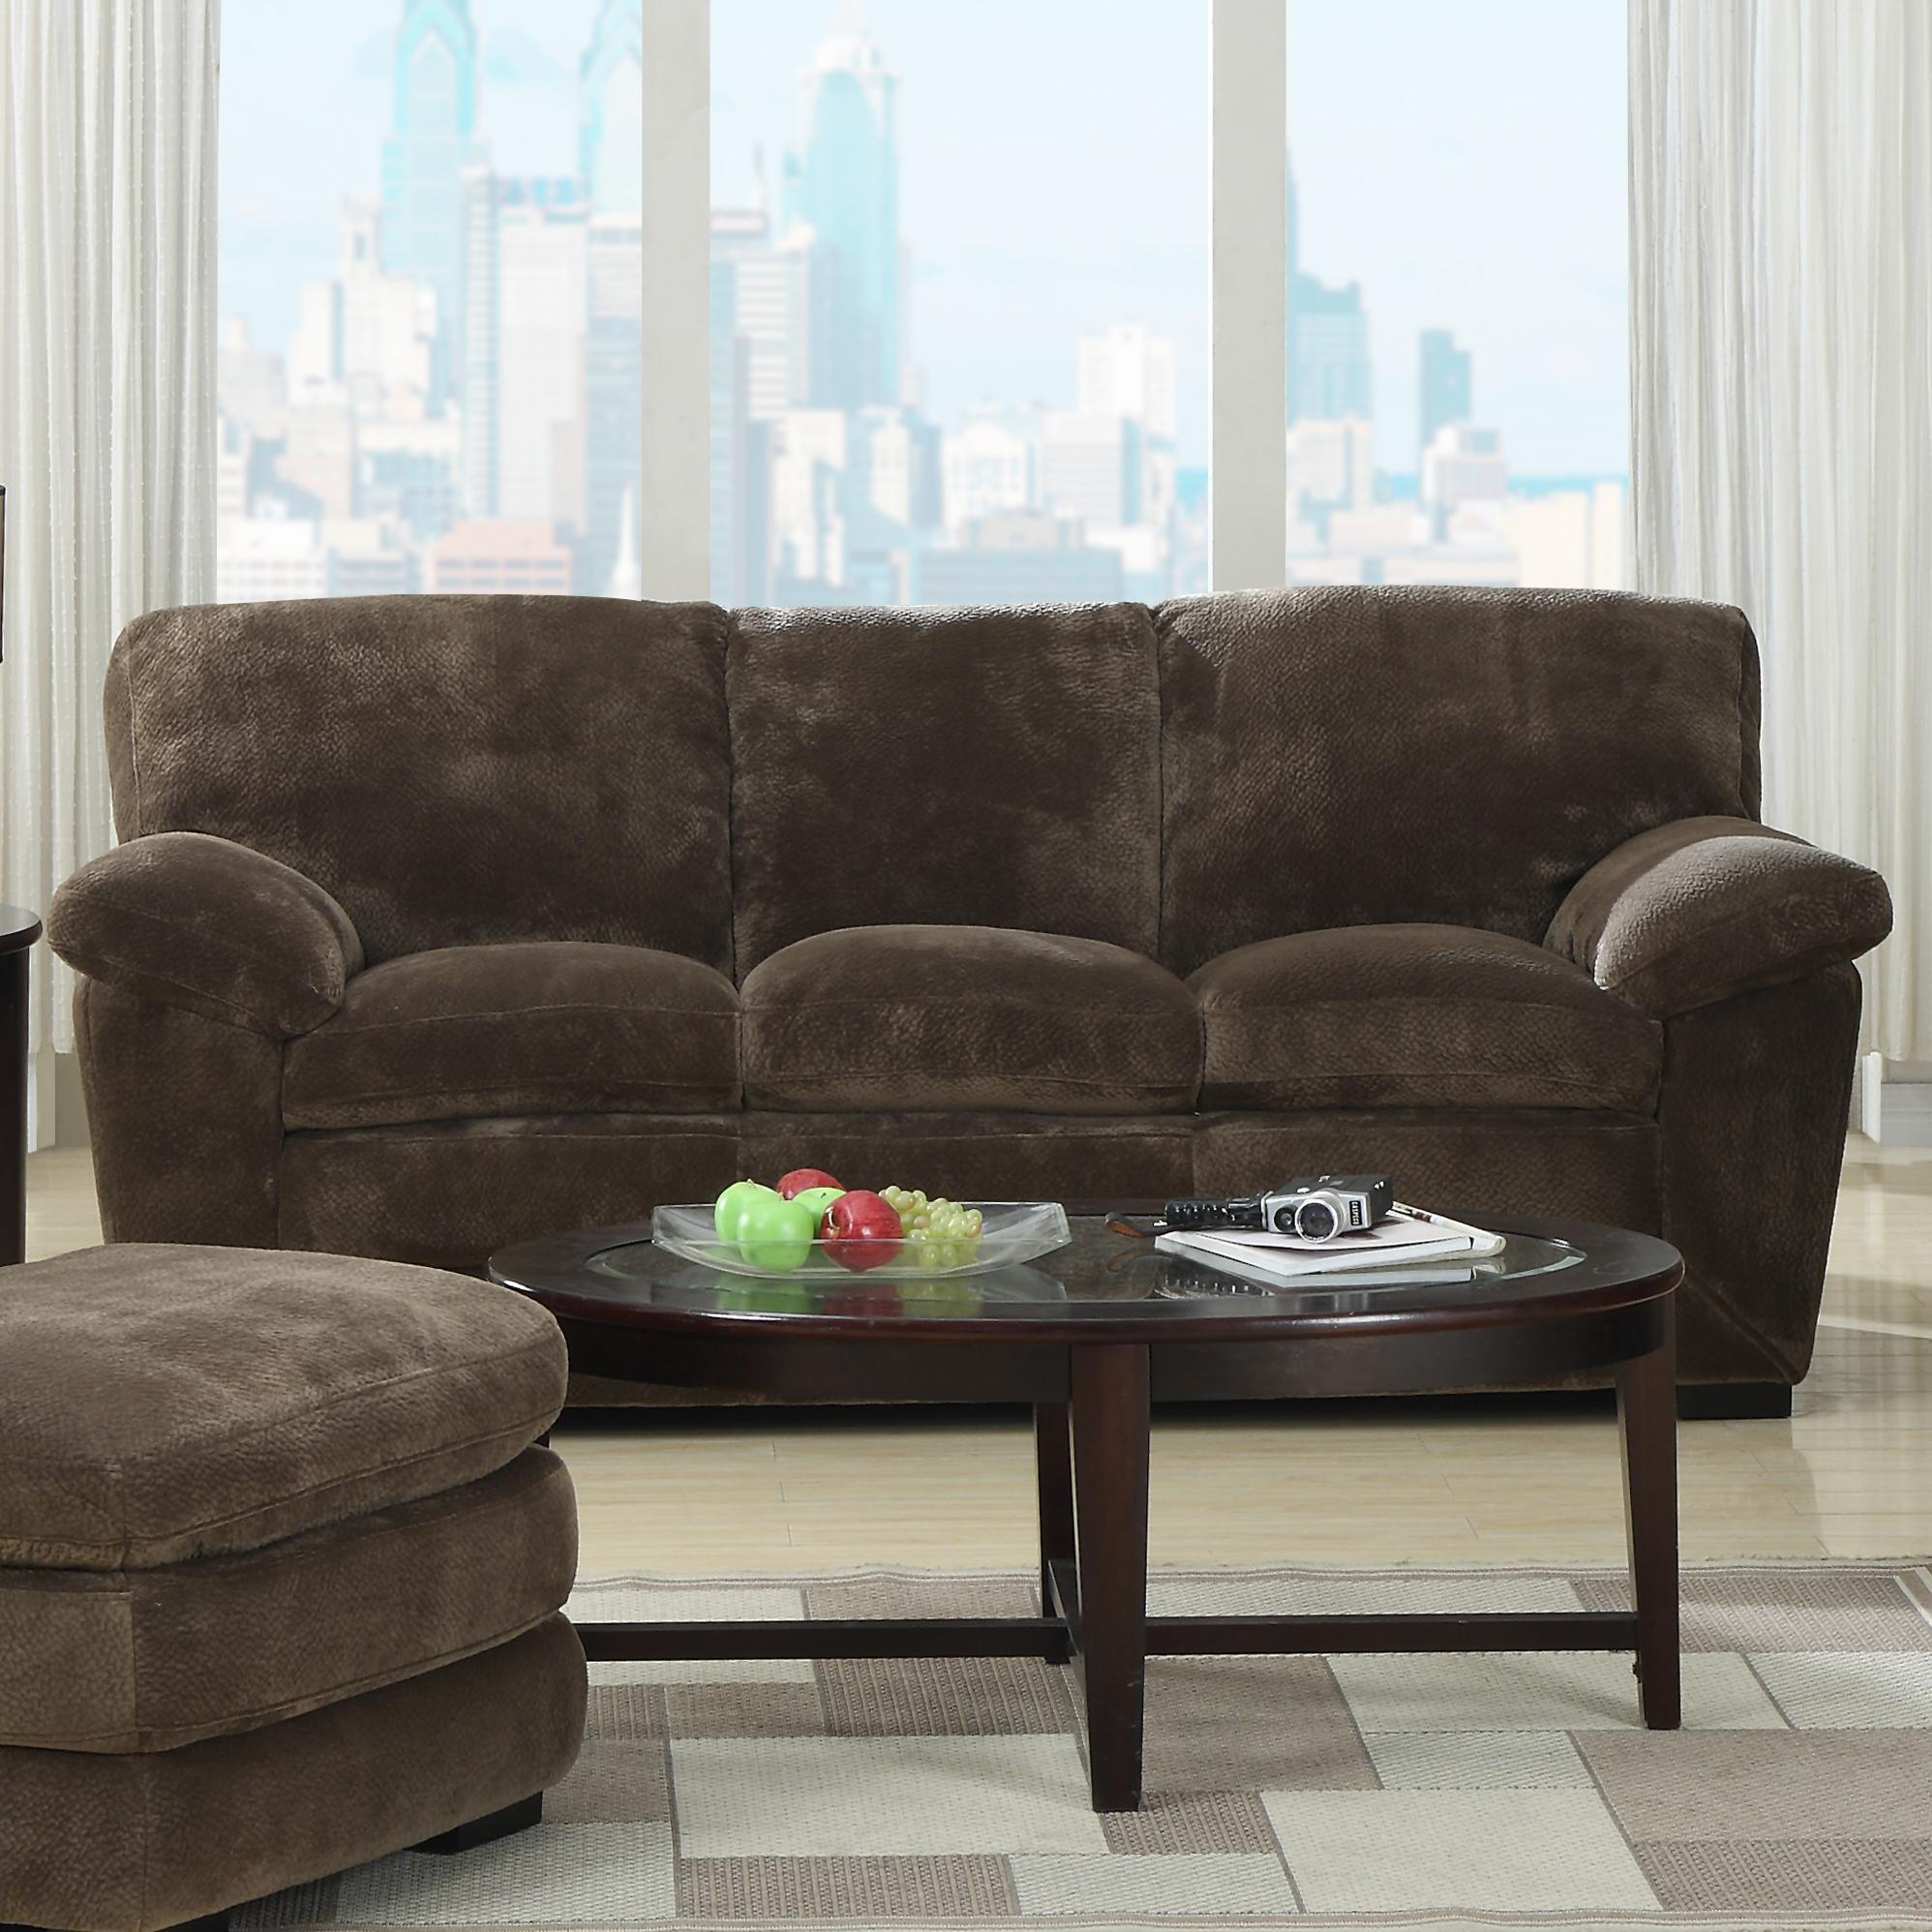 Emerald Devon Sofa   Item Number: U3203 00 05